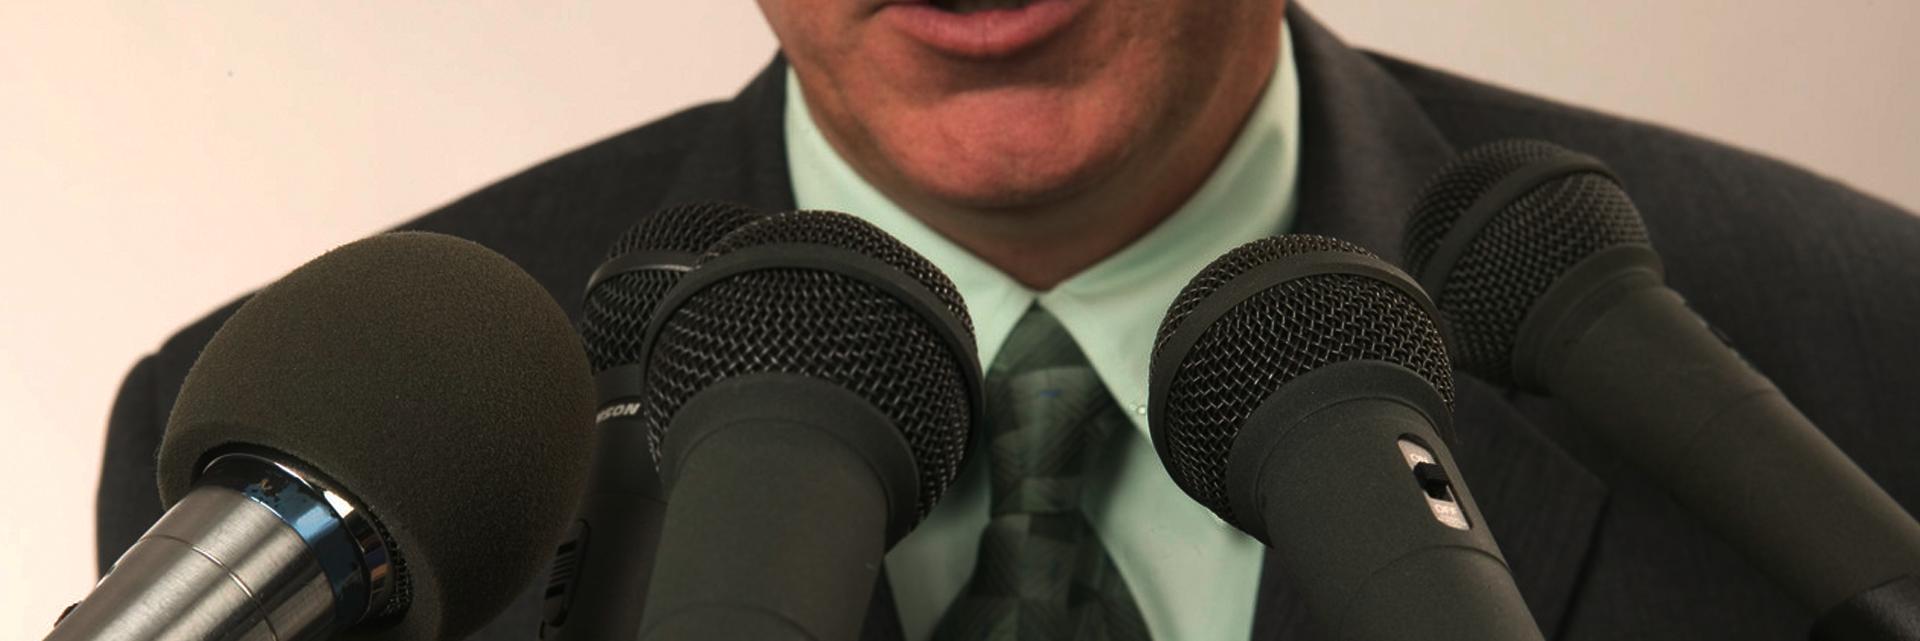 public speaking phobia help